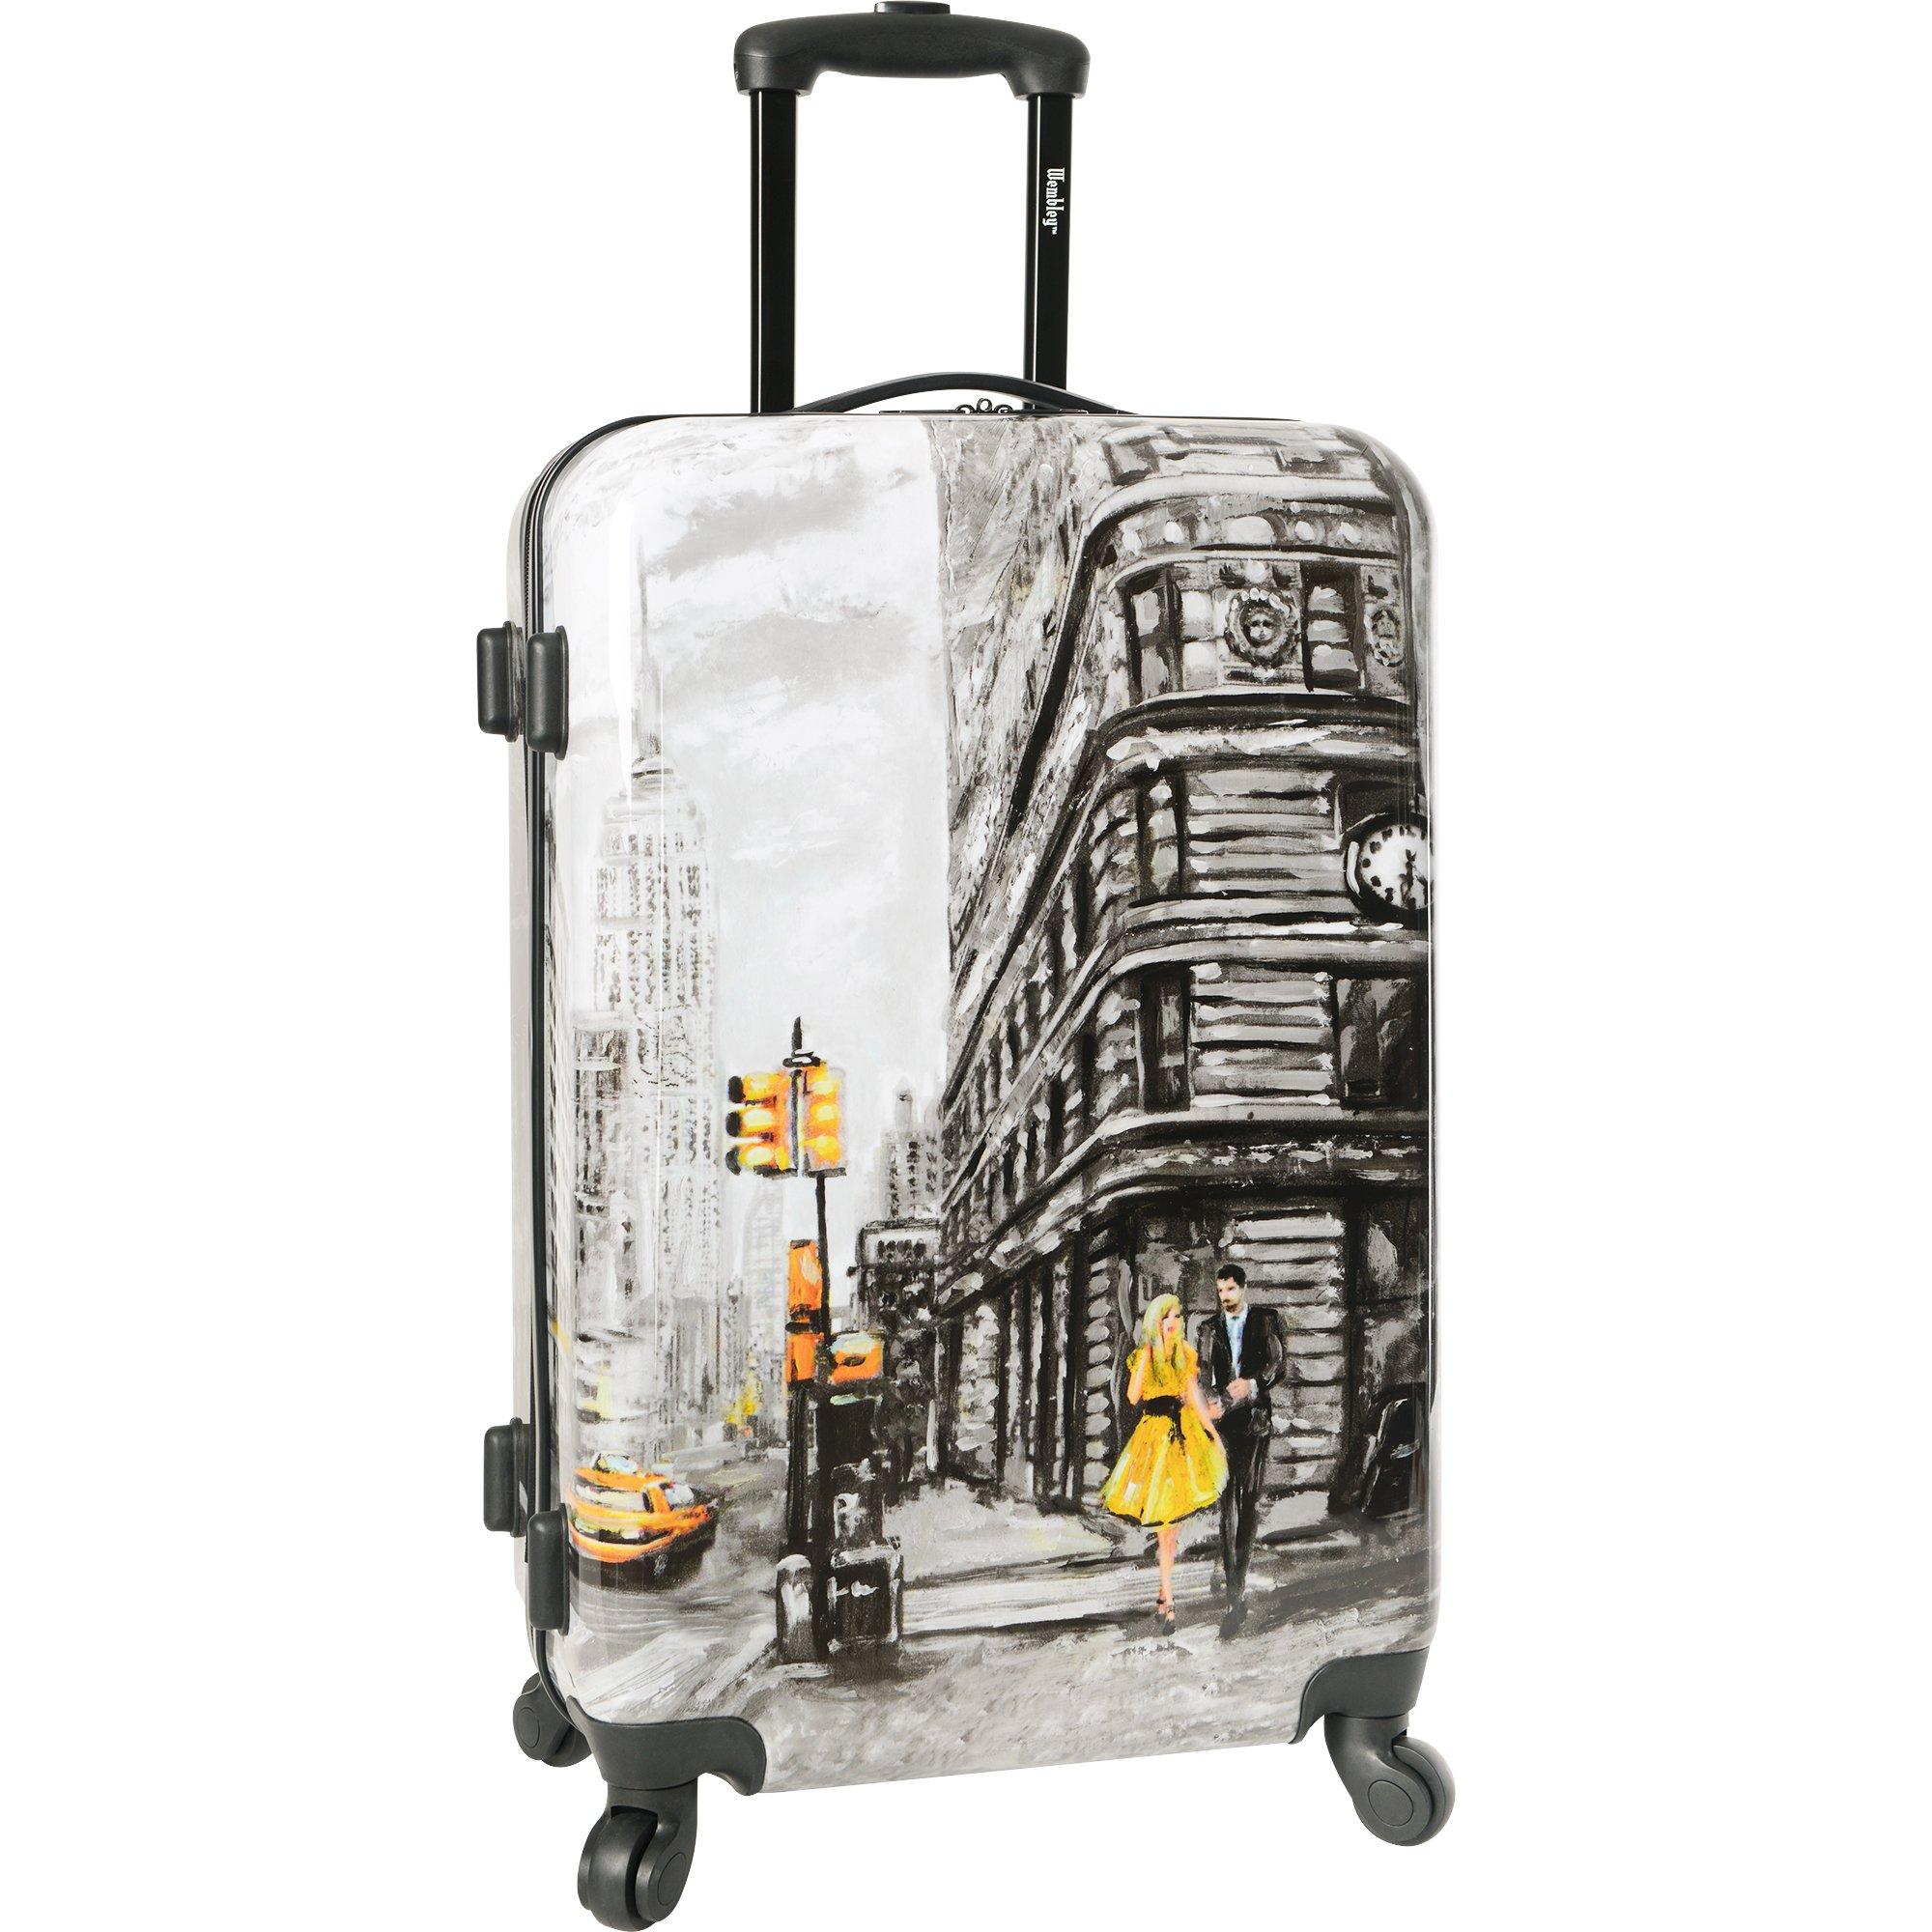 Wembley 20'' Hardside Carry-on 4wheel Spinner Luggage, NYC